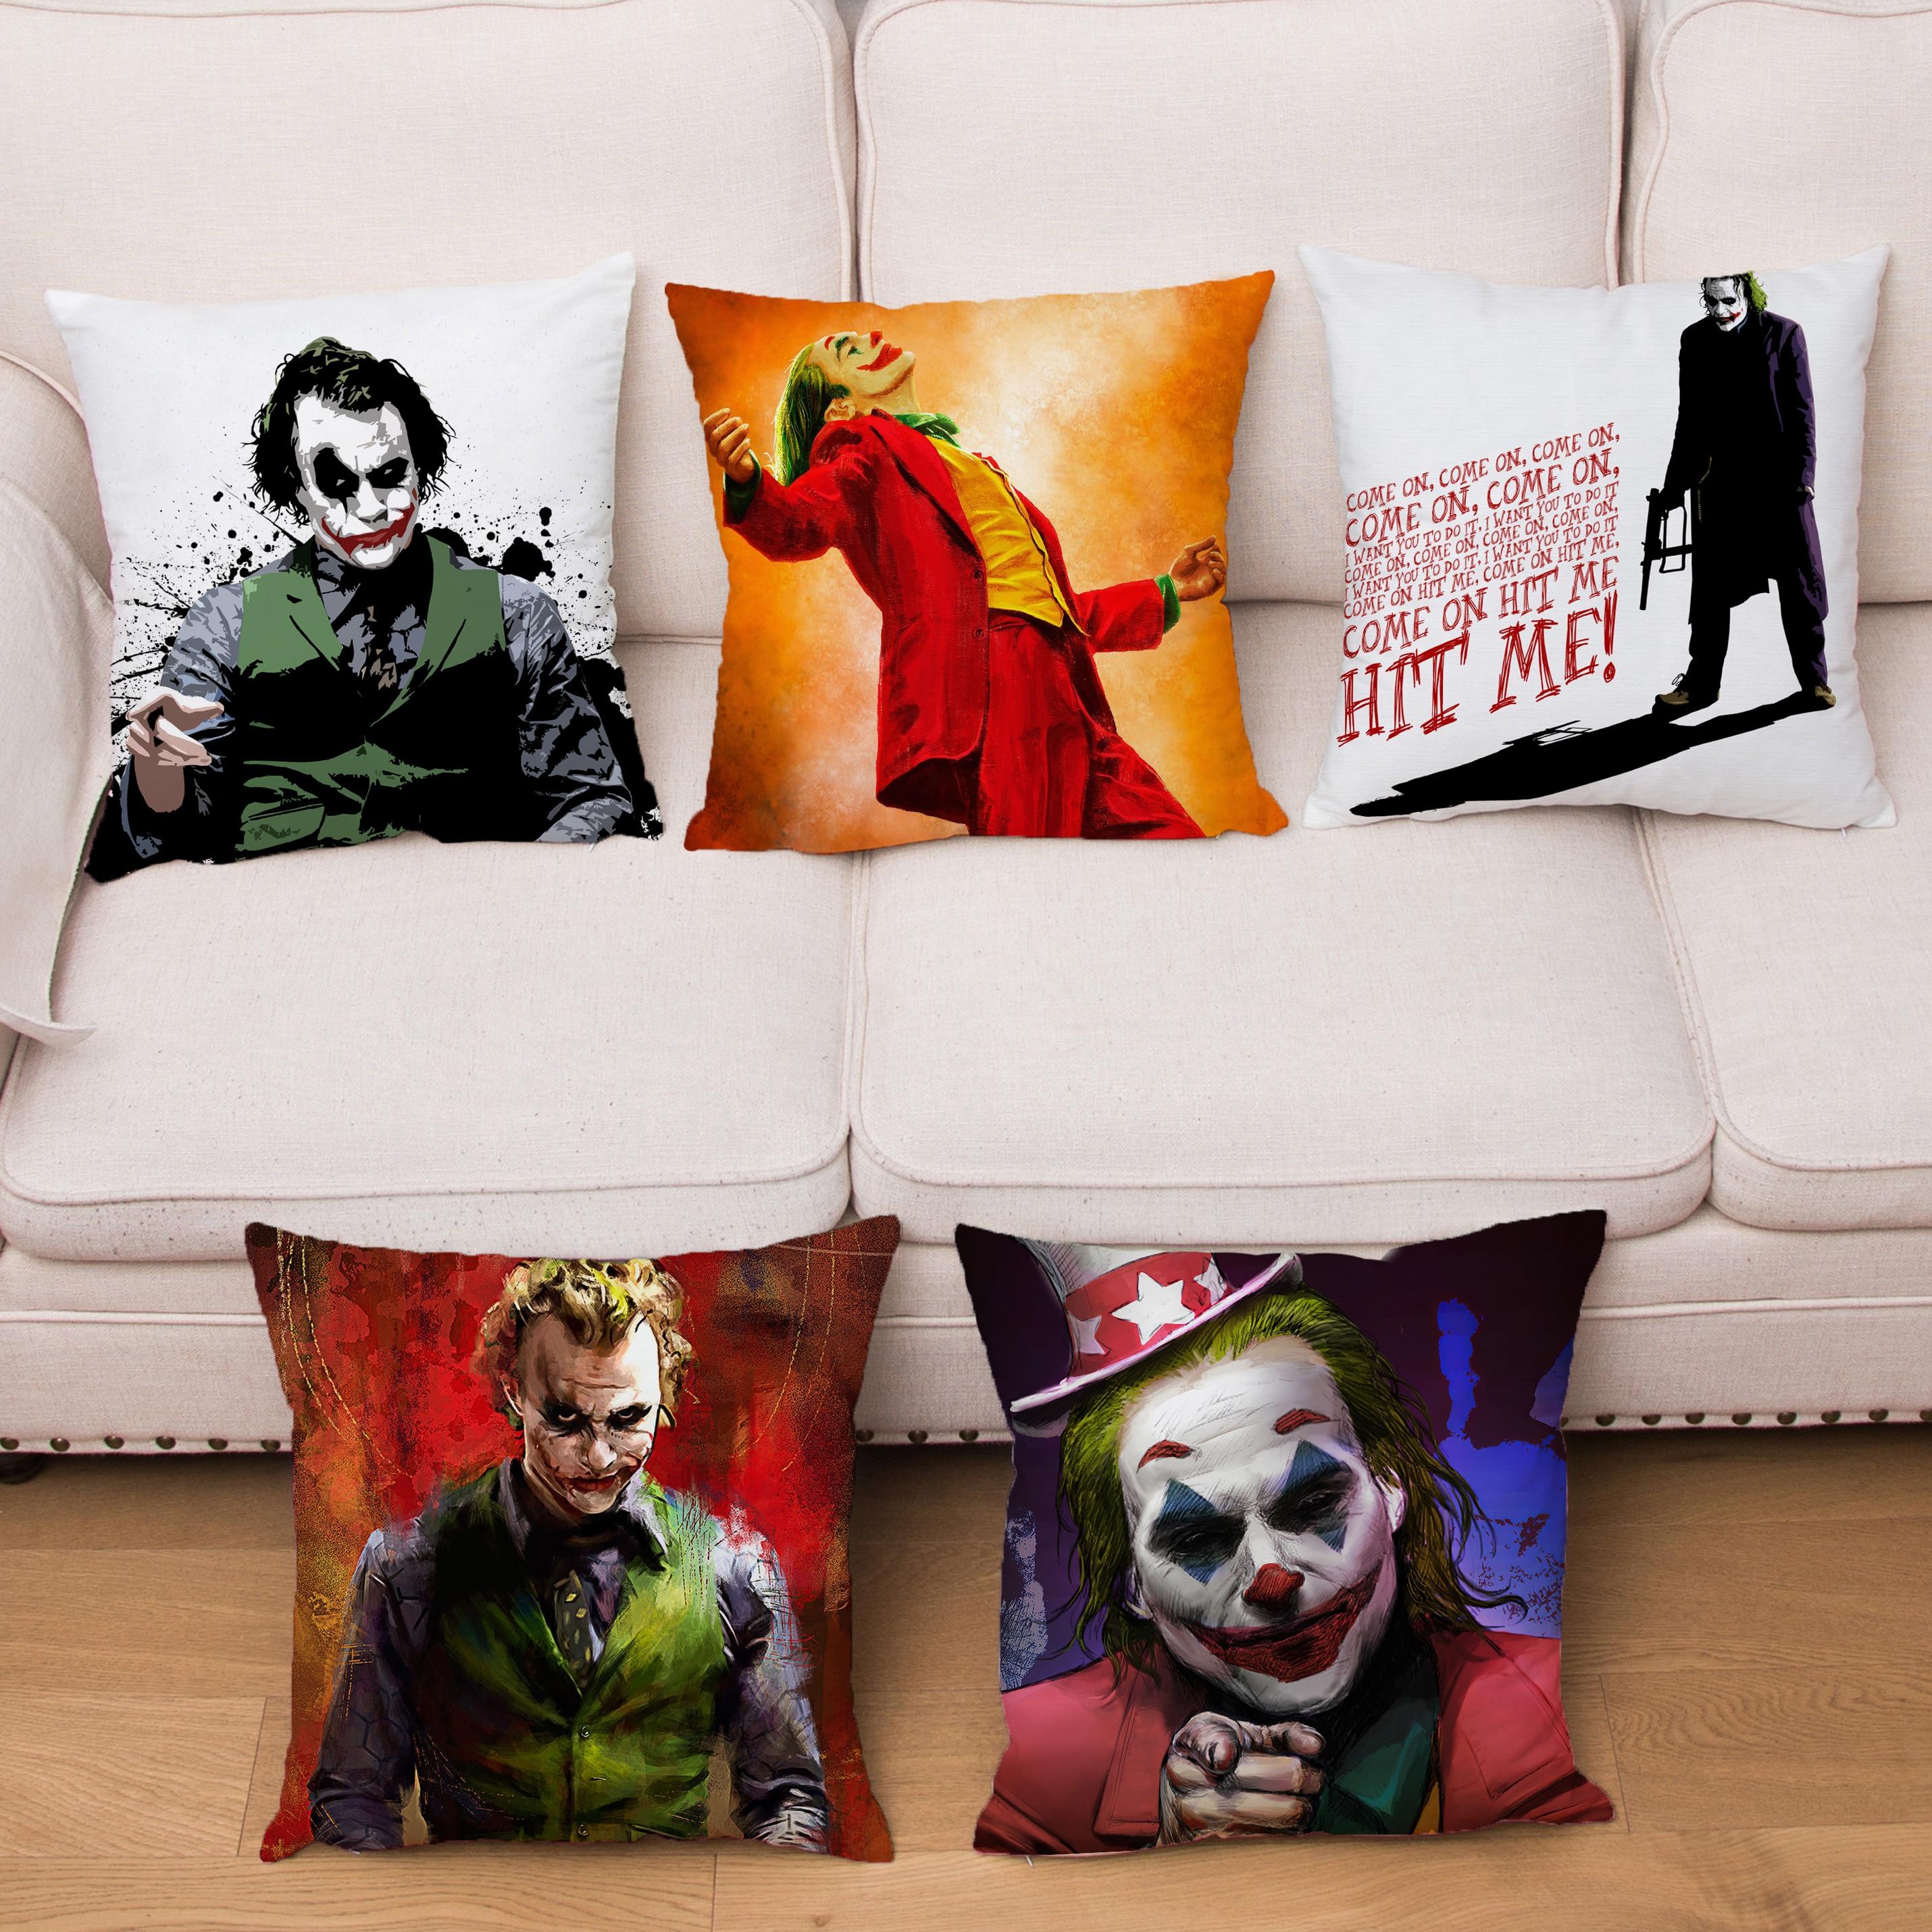 Comic Clown Joker Print Pillow Cover Short Plush Cushion Covers 45*45 Square Pliiows Cases Sofa Home Decor Pillowcase